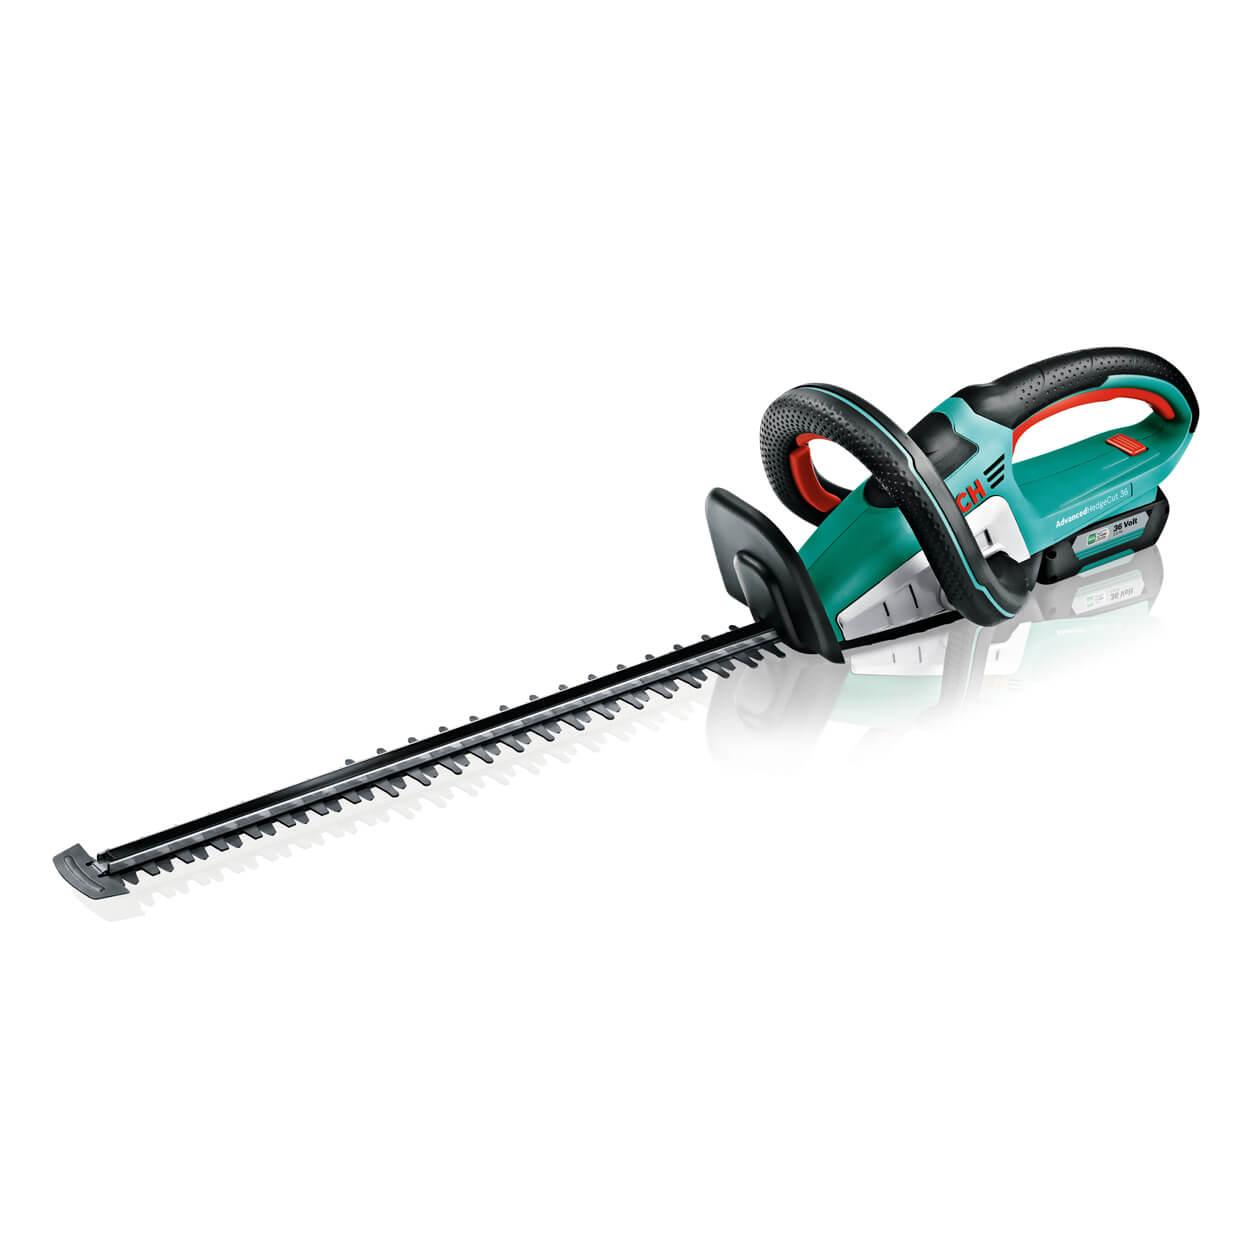 "bosch advancedhedgecut 36 36cm (14"") cordless hedge trimmer - handy"